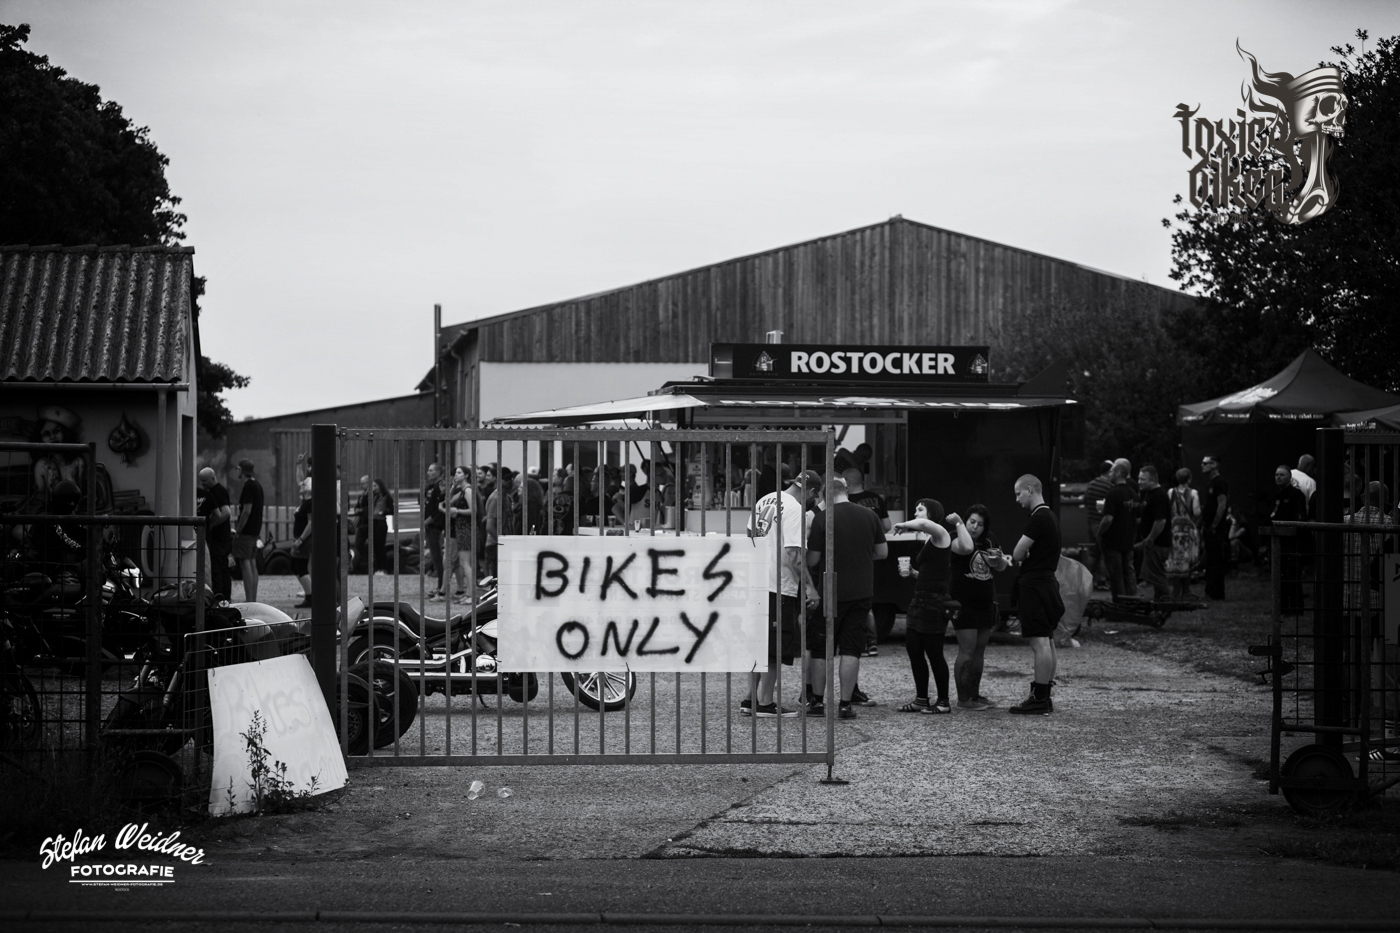 c-Stefan-Weidner-Fotografie_Toxic-Bikes-Hohenfelde_15-08-2015_IMG_3969-Bearbeitet.jpg